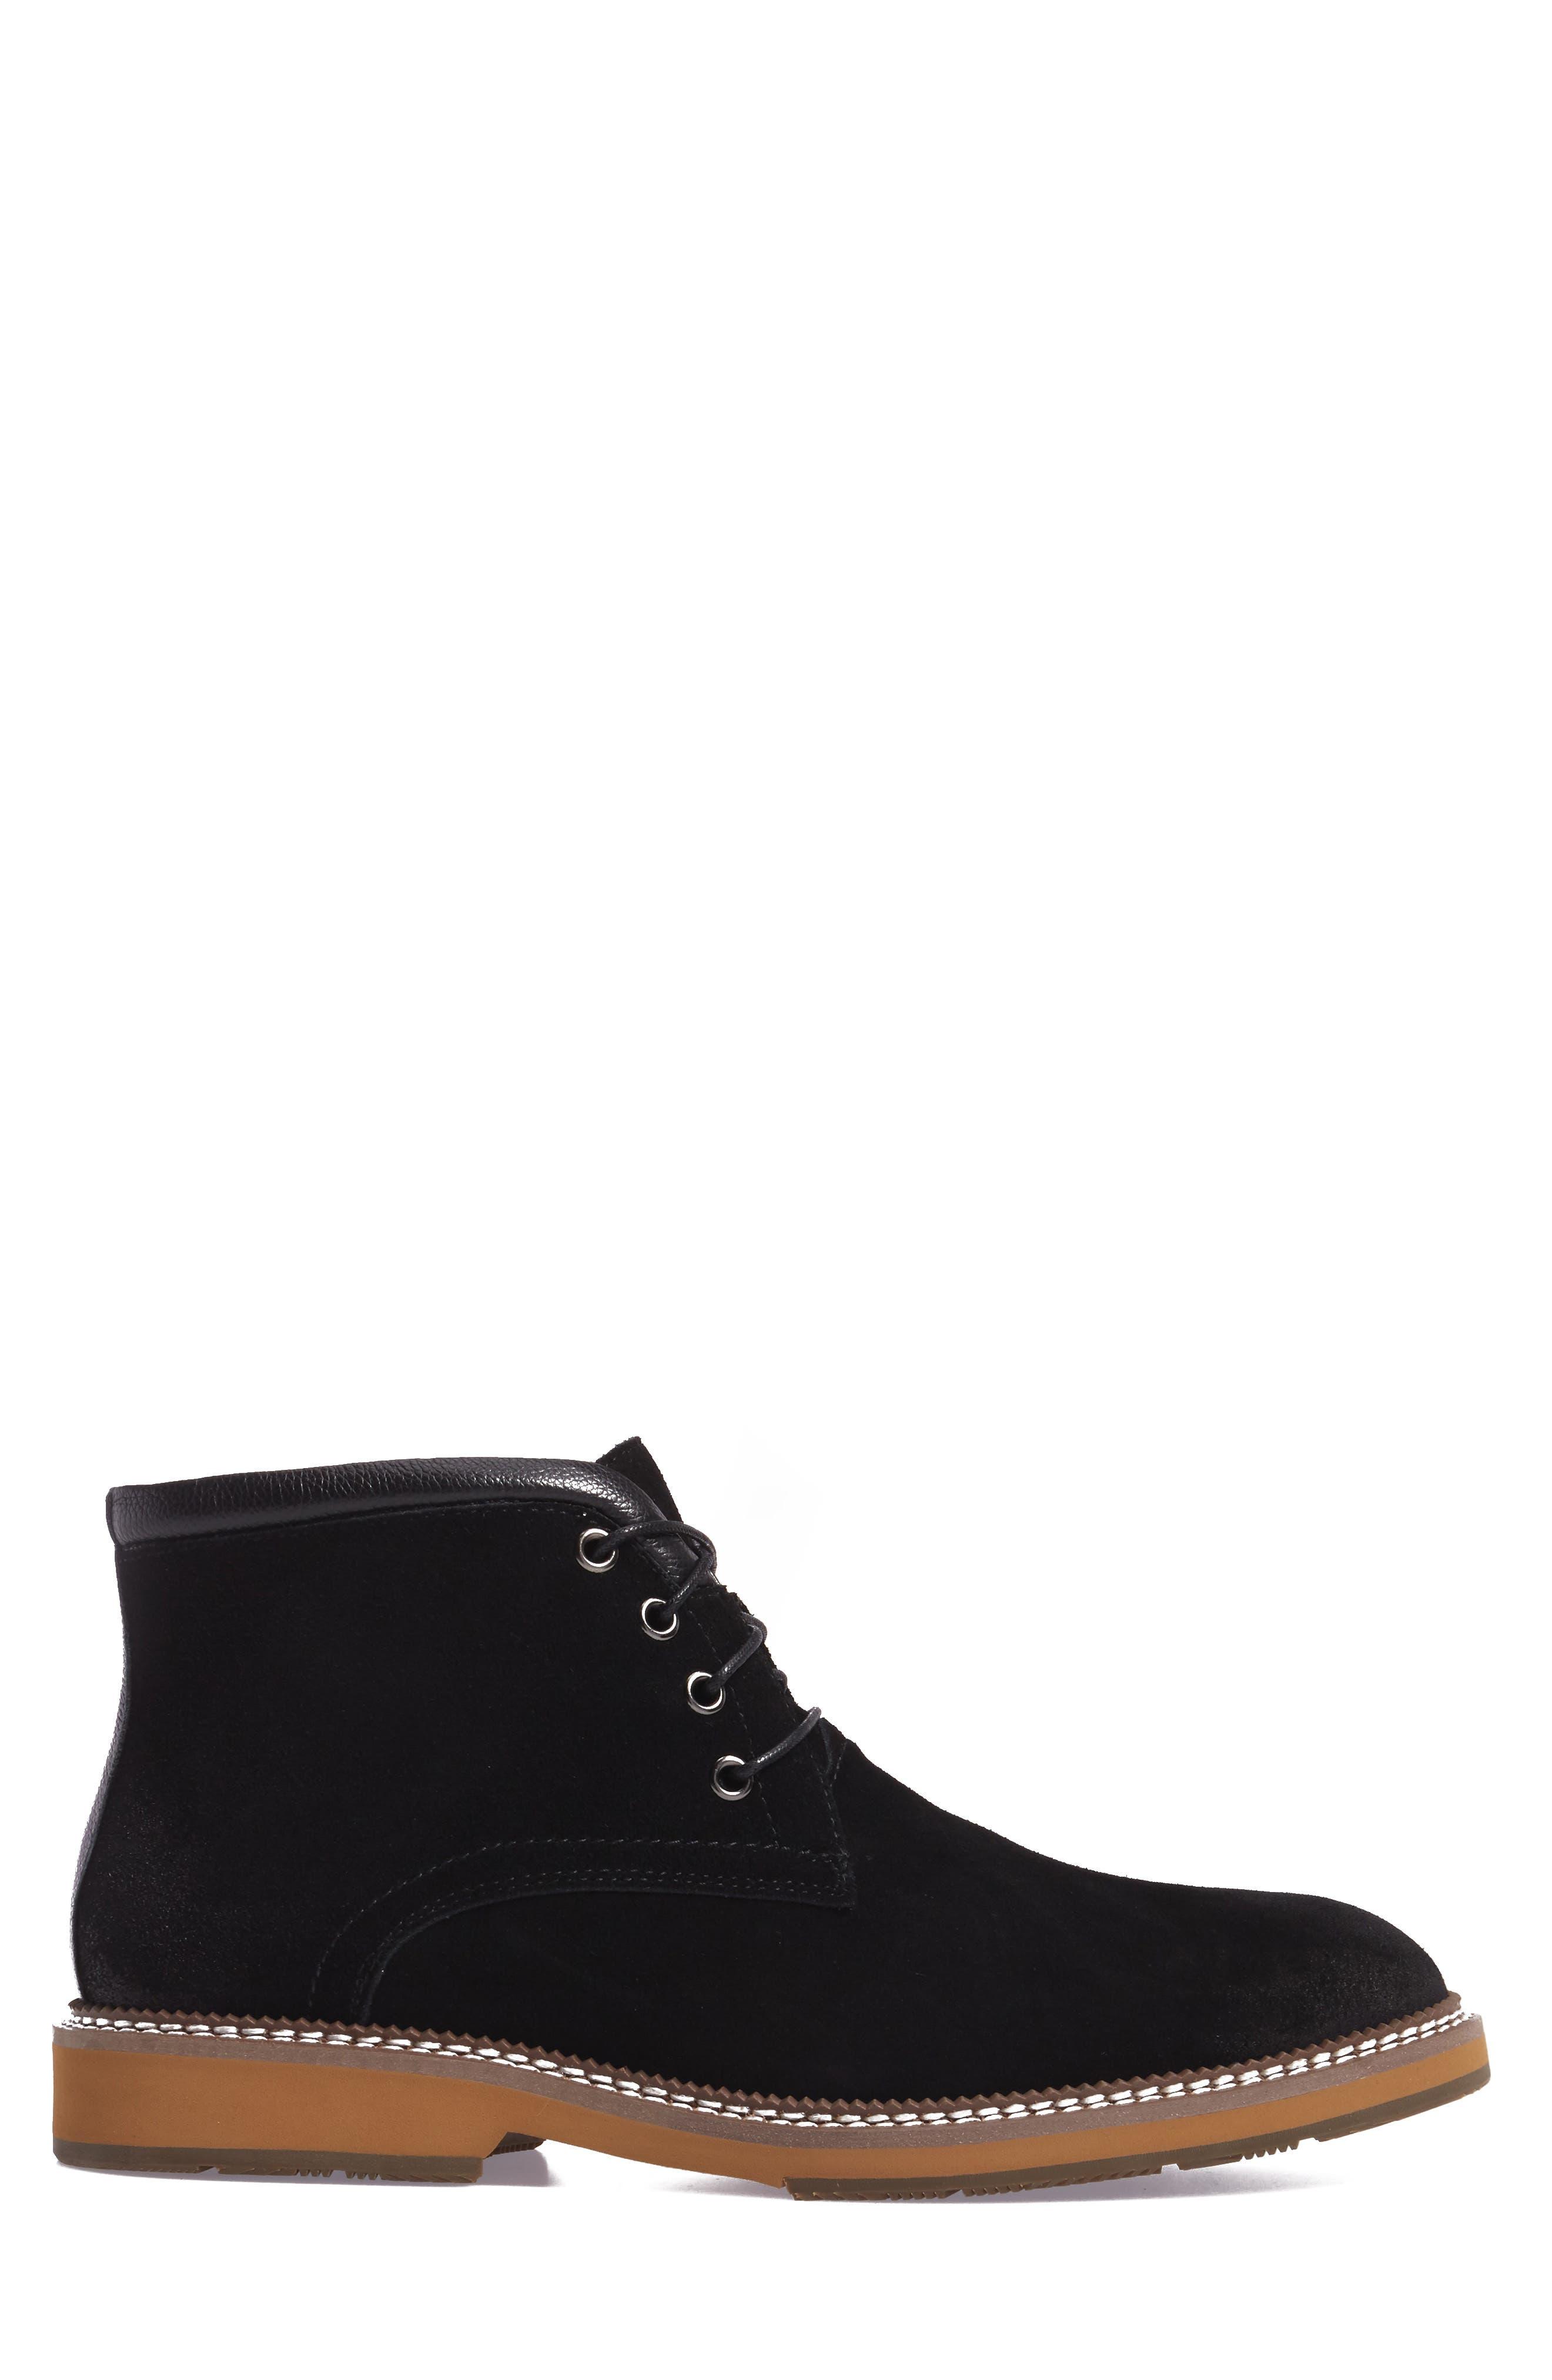 Lazo Chukka Boot,                             Alternate thumbnail 3, color,                             Black Leather